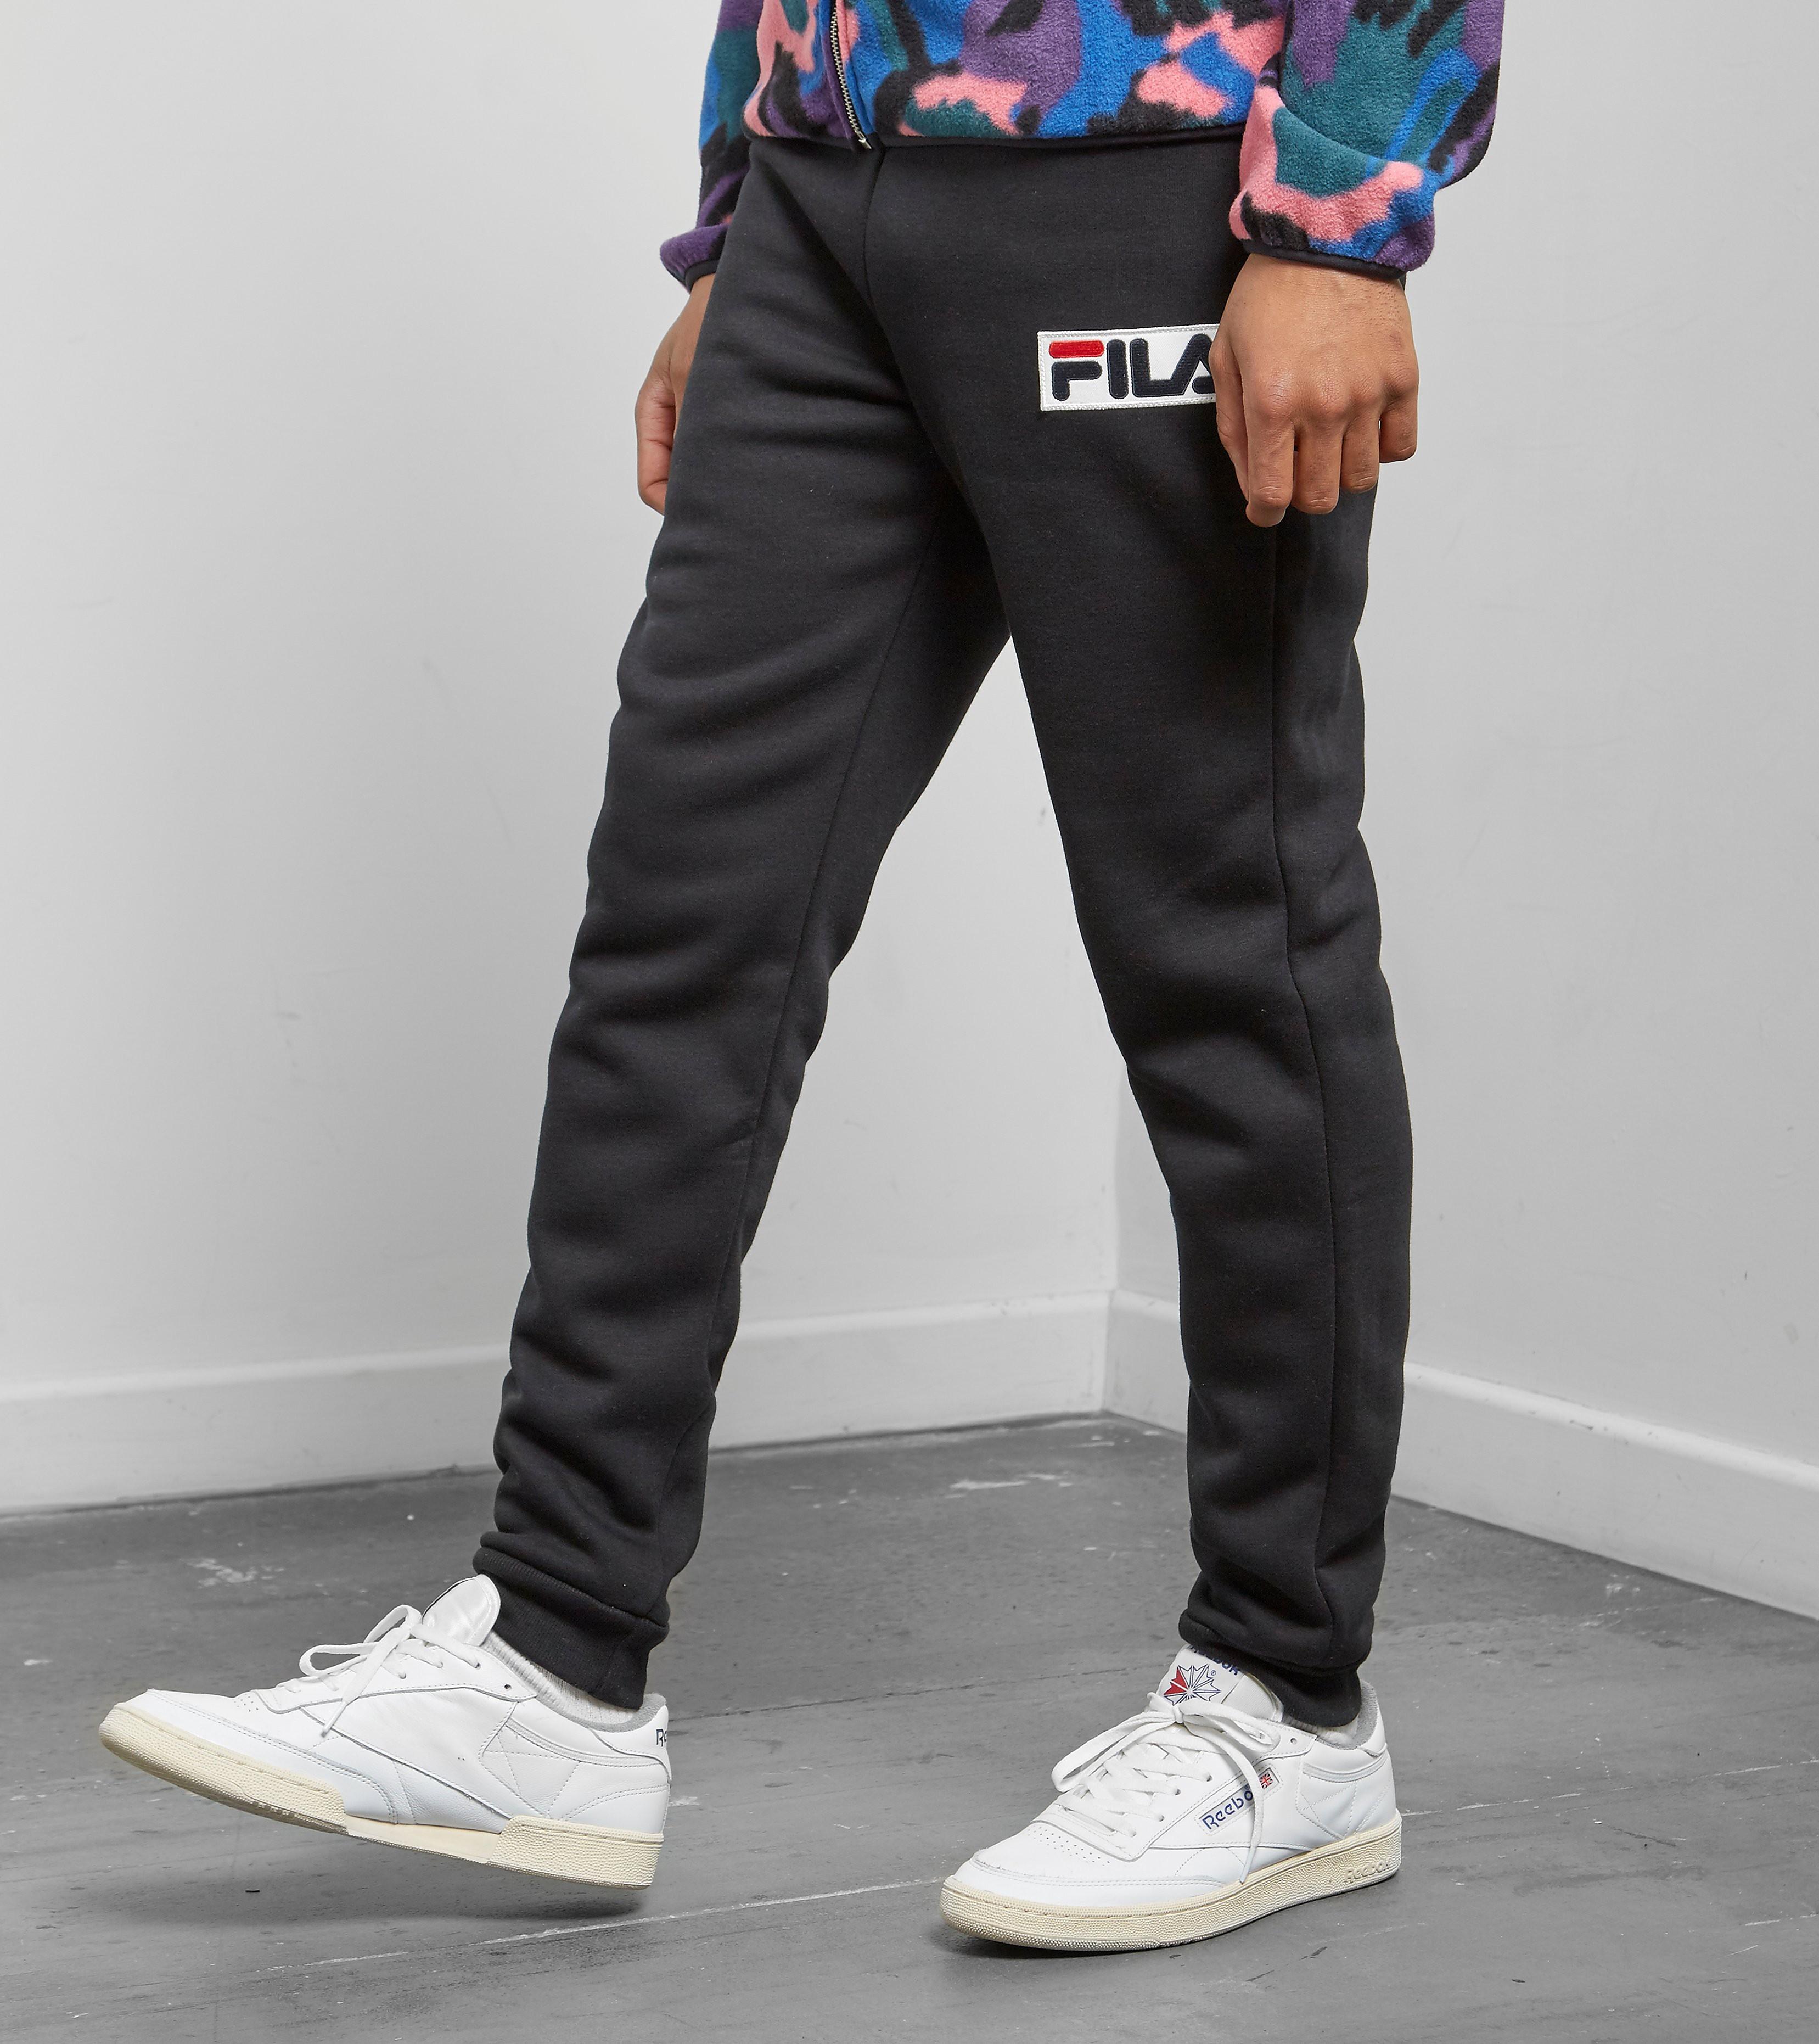 Fila Lazey Fleece Pant - size? Exclusive